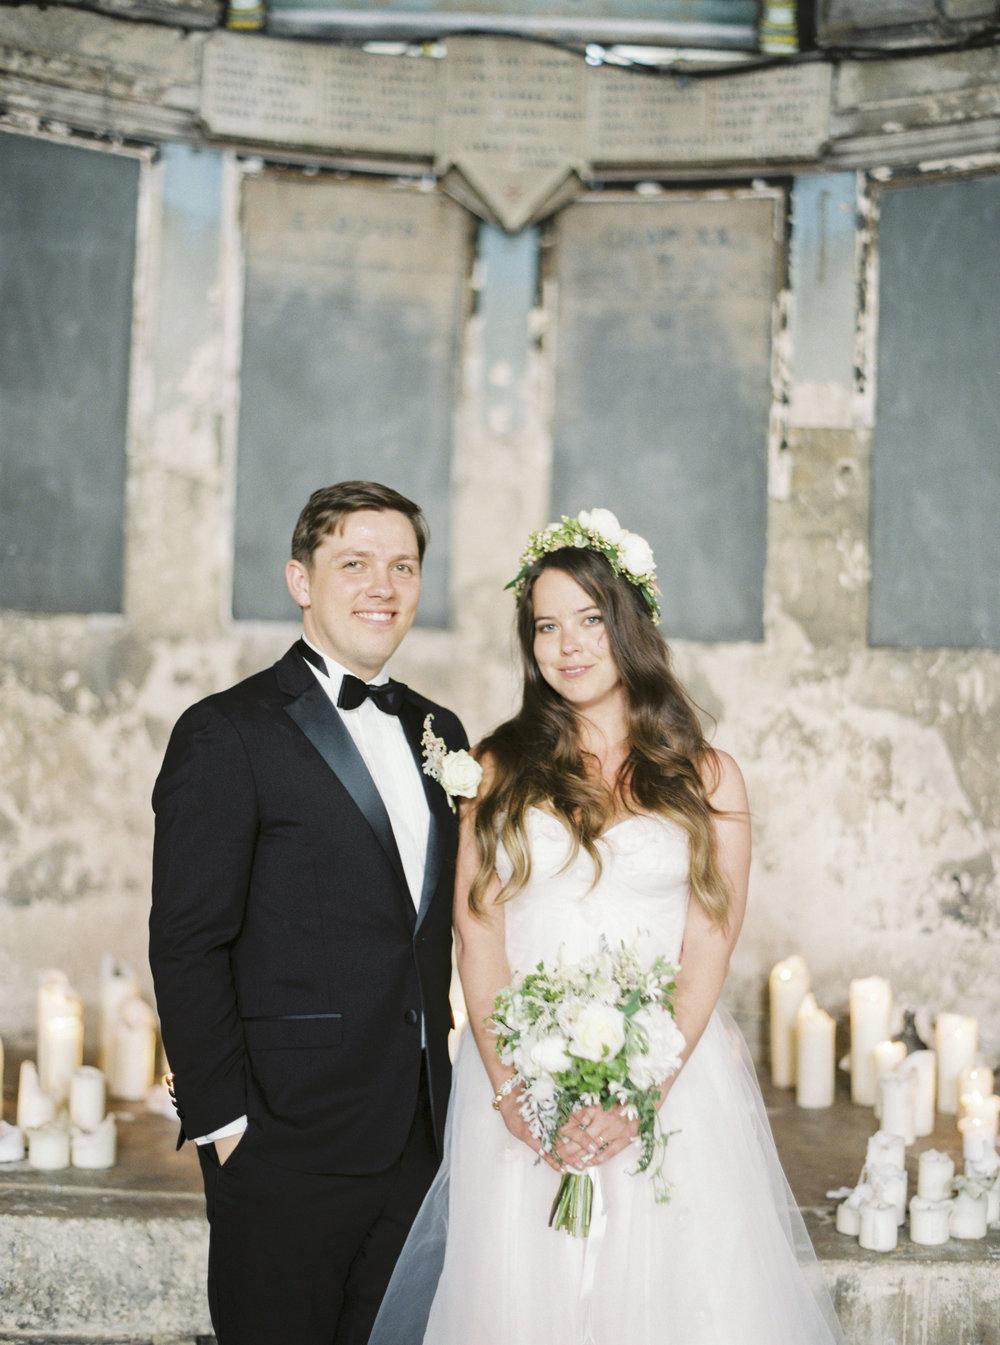 BM_Ayslum_Peakham_Wedding_ZosiaZachariaPhotography174.JPG